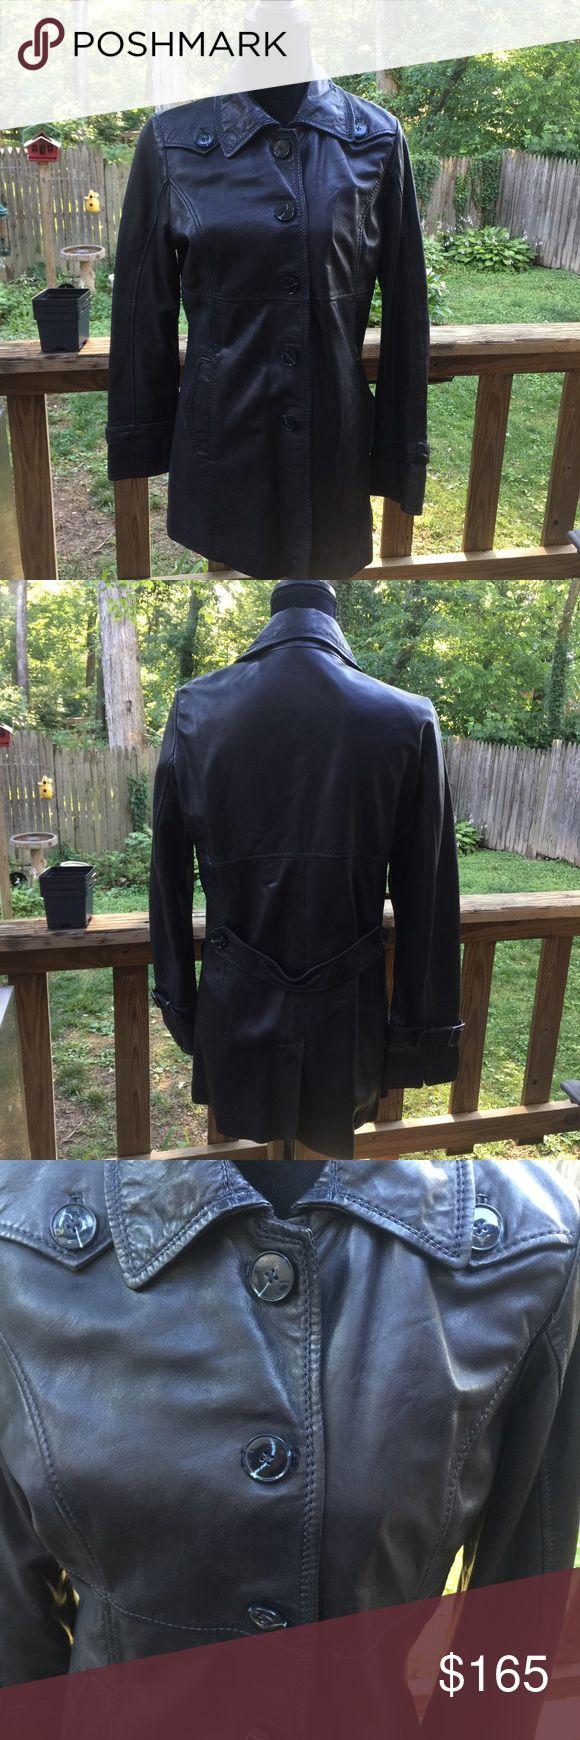 Oakwood Lambskin Leather Jacket Amazingly soft and well made Lambskin leather jacket. European brand. Deep navy blue color. Oakwood Jackets & Coats